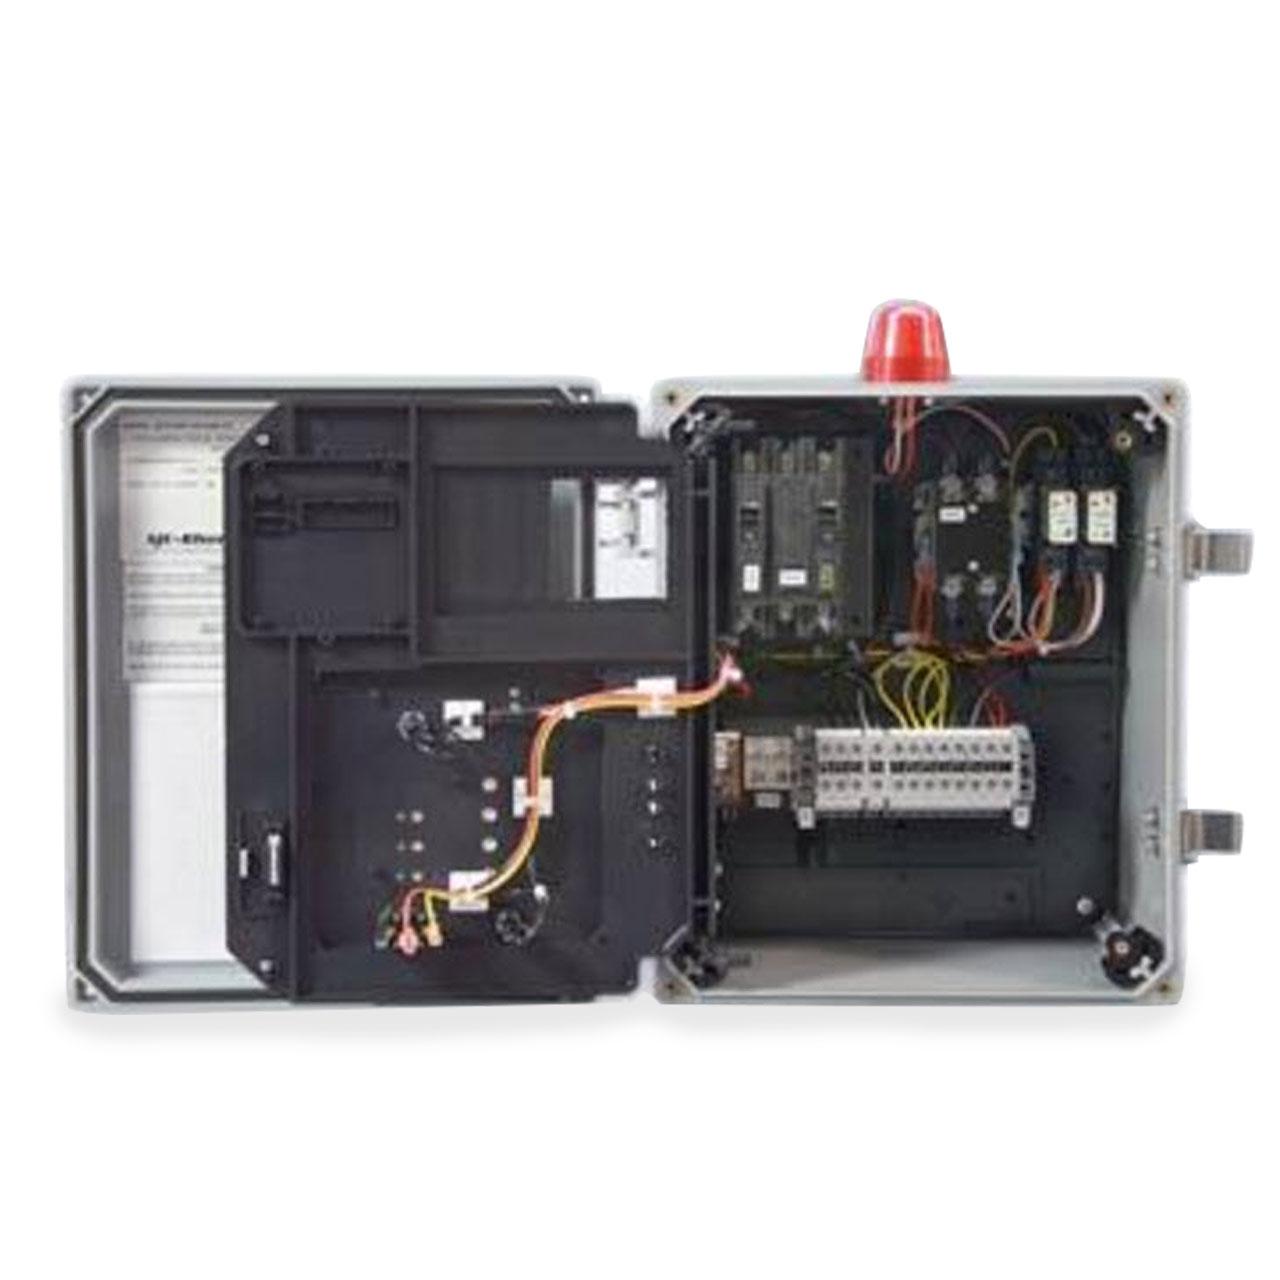 hight resolution of sje rhombus sje rhombus rls relay logic series motor contactor single phase duplex pump control panel cp sjerls1038